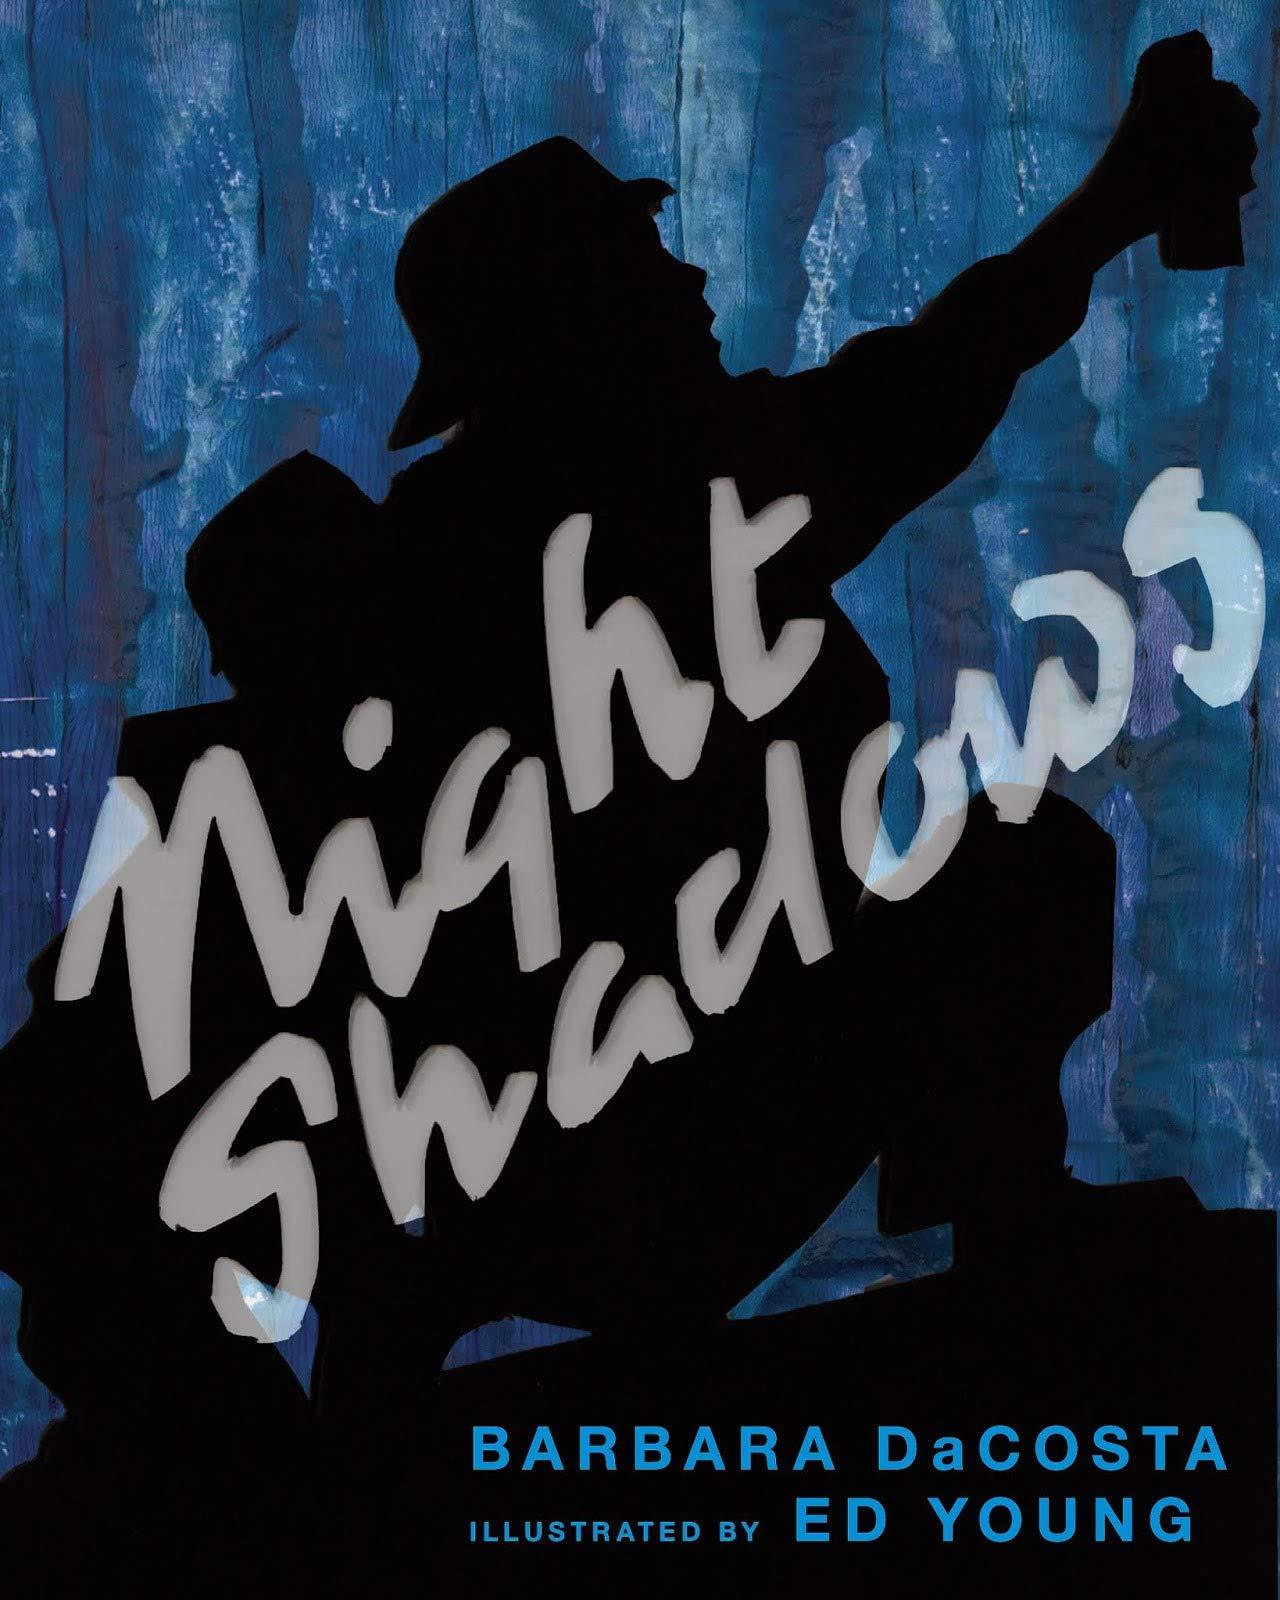 Night Shadows: DaCosta, Barbara, Young, Ed: 9781644210246: Amazon.com: Books